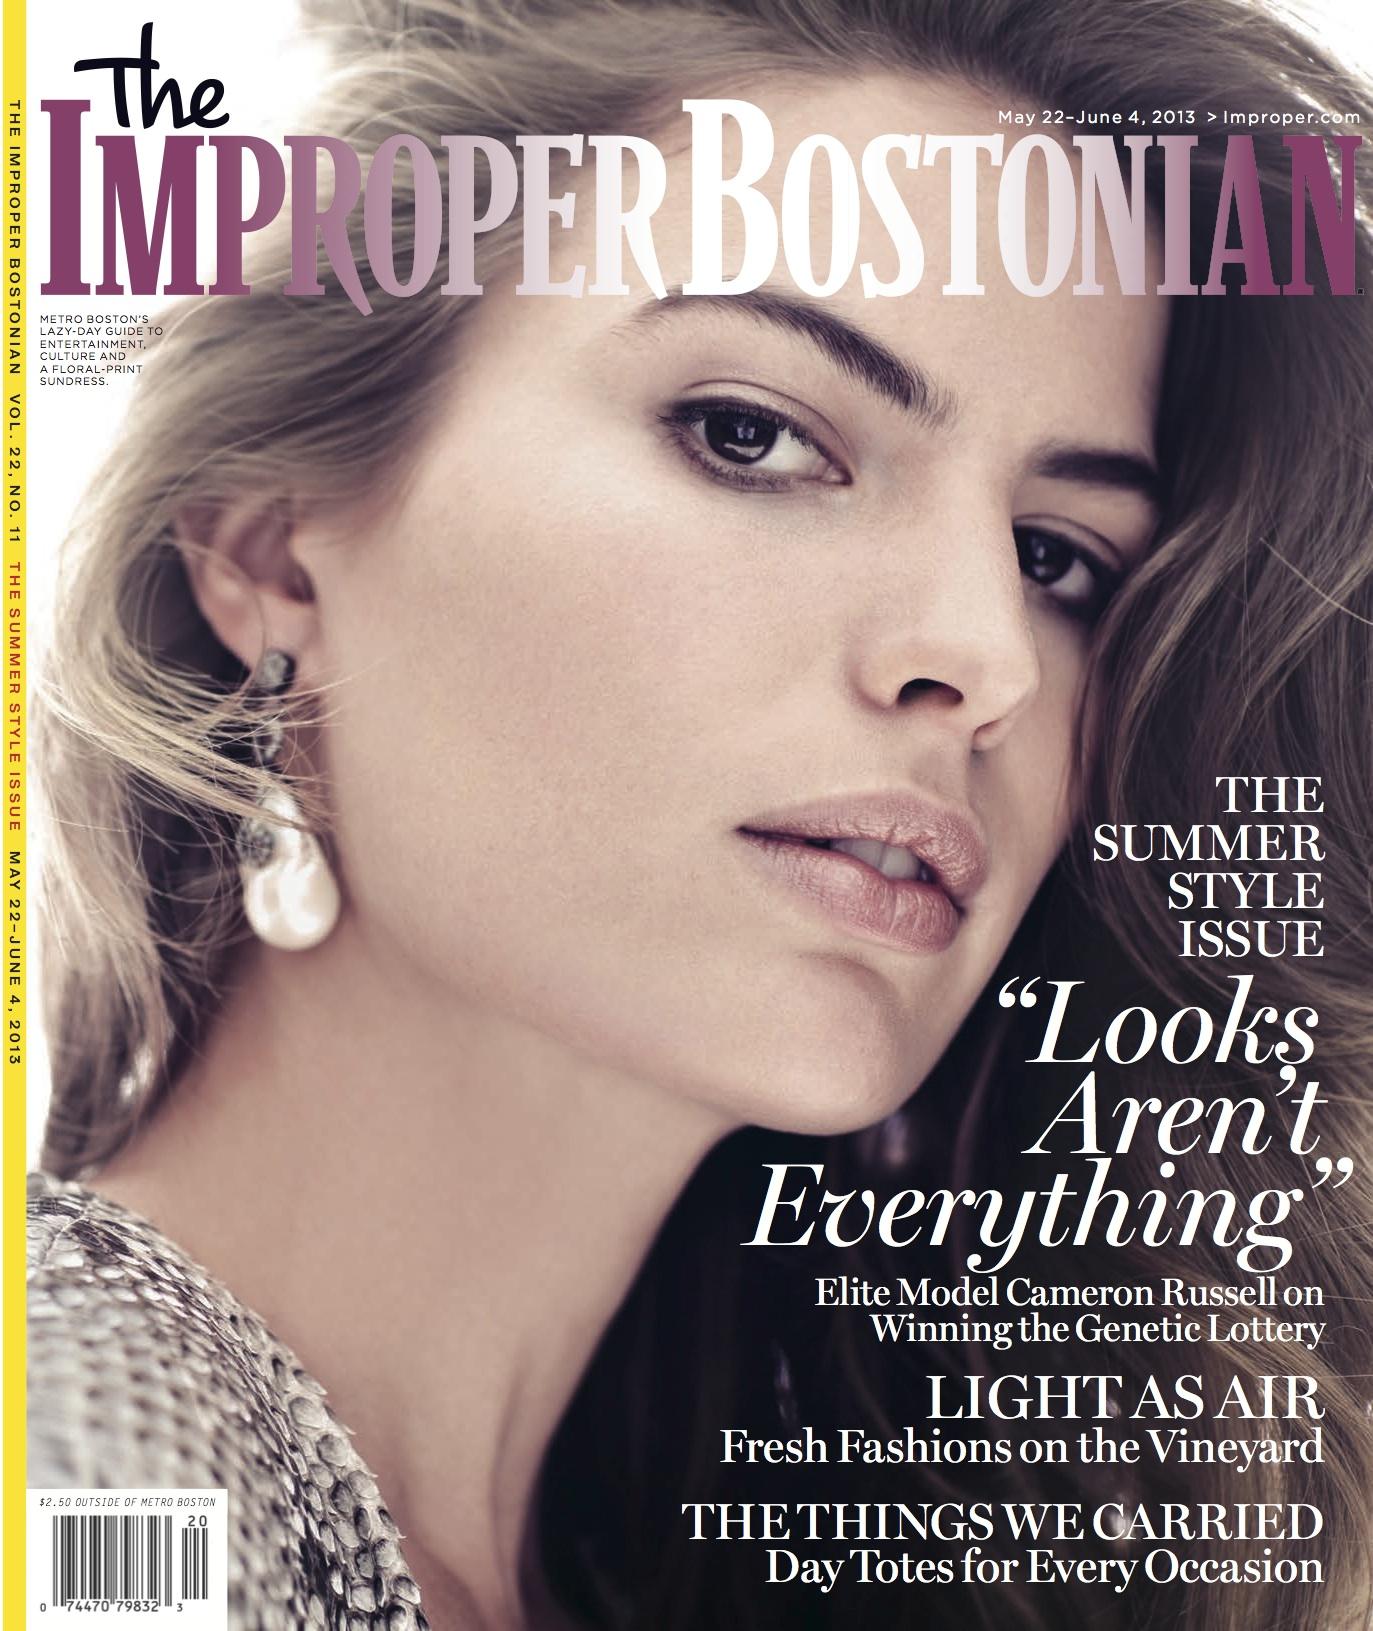 Improper Bostonian: CAMERON RUSSELL FOR THE IMPROPER BOSTONIAN BY RUBIN SINGER